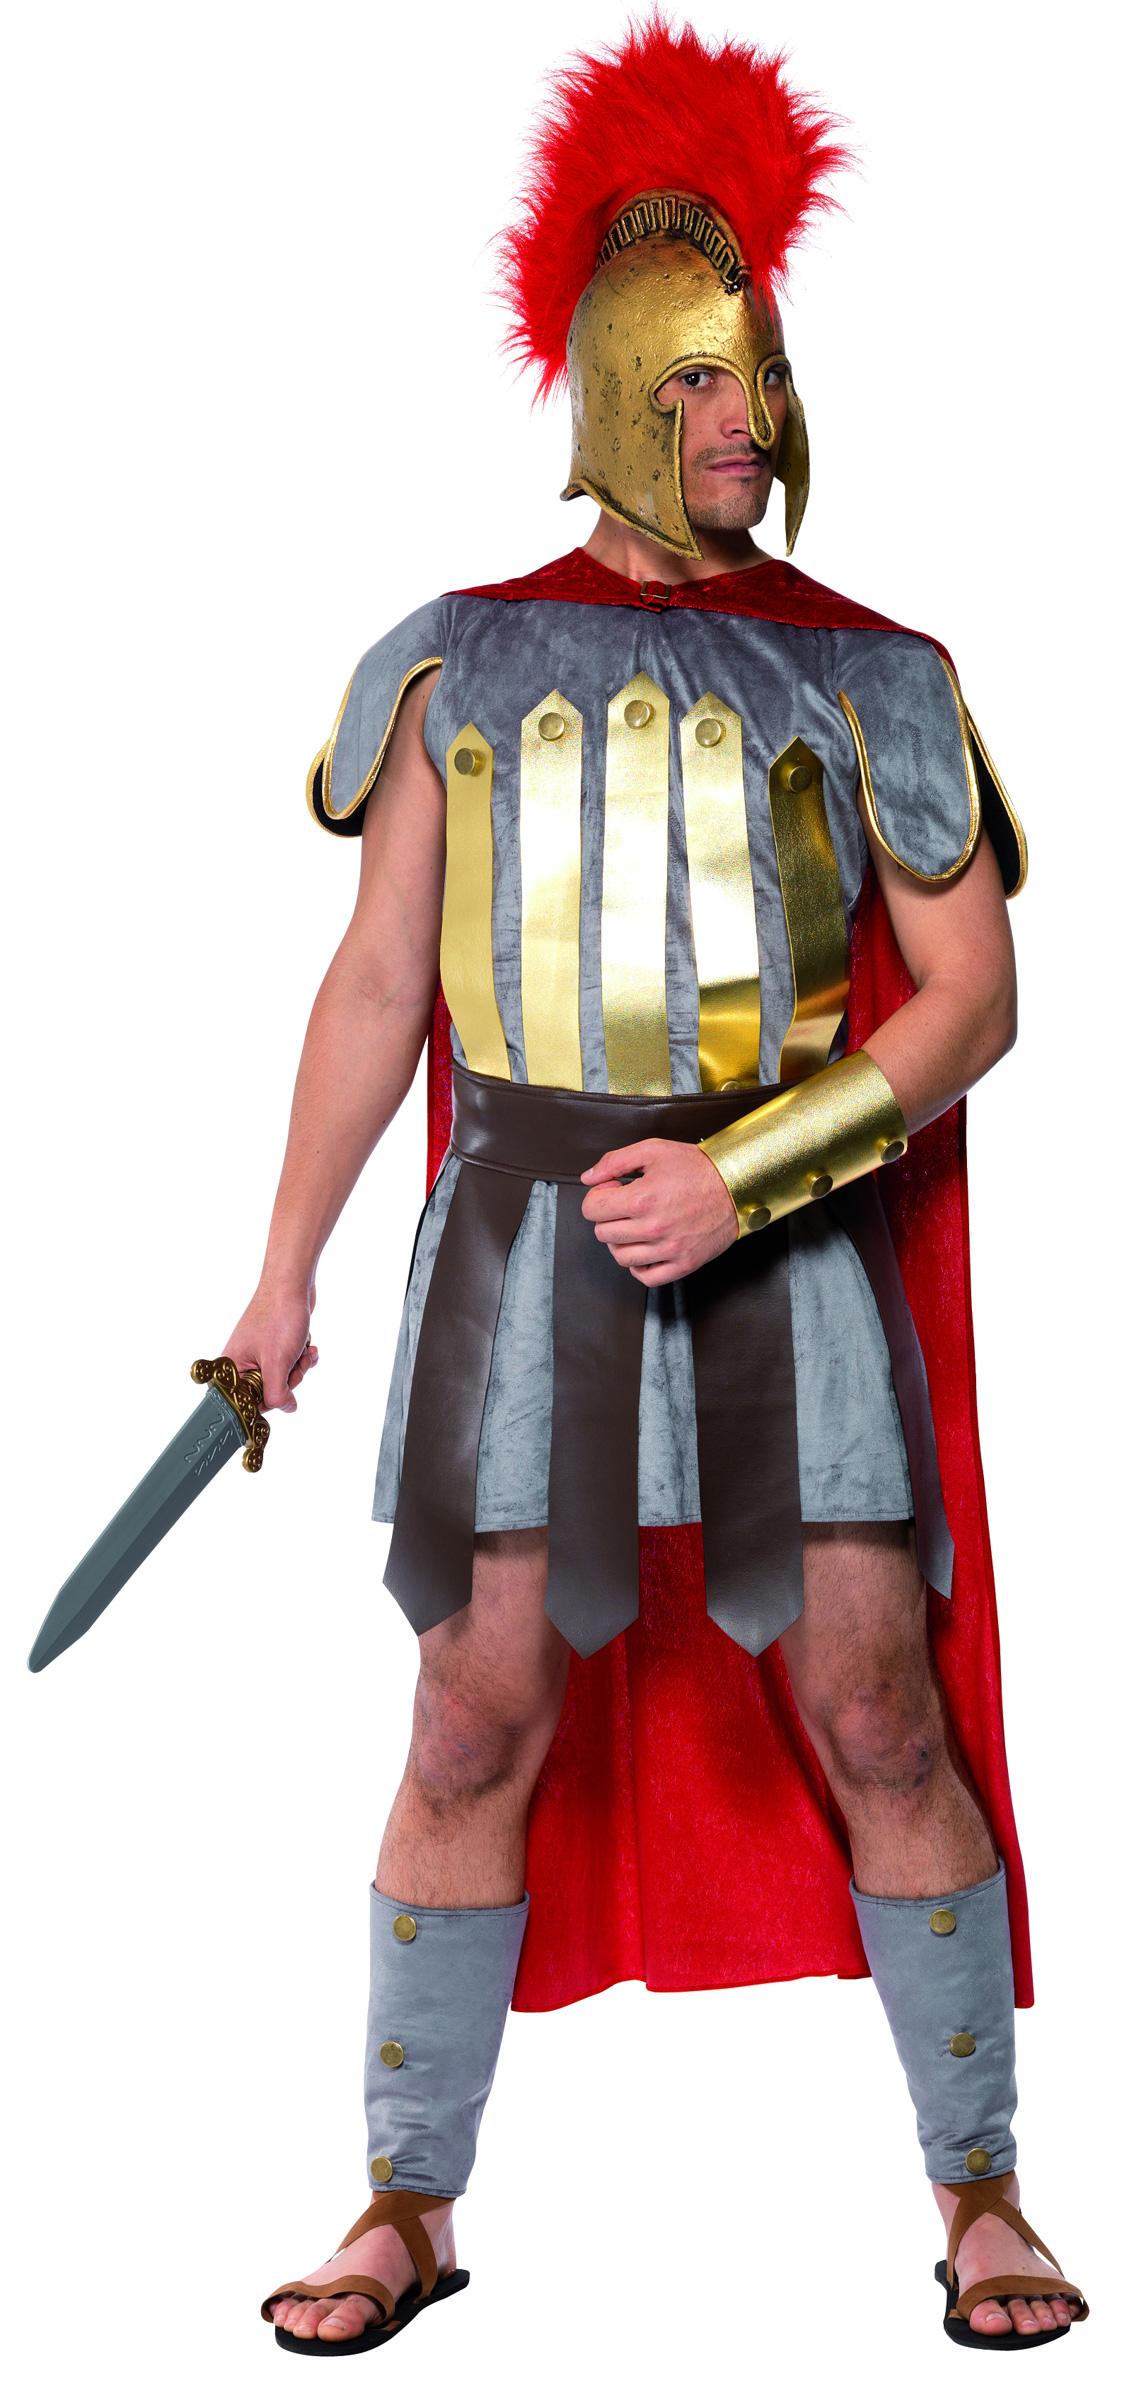 70baa2782e8b2 Déguisement gladiateur romain homme : Deguise-toi, achat de ...